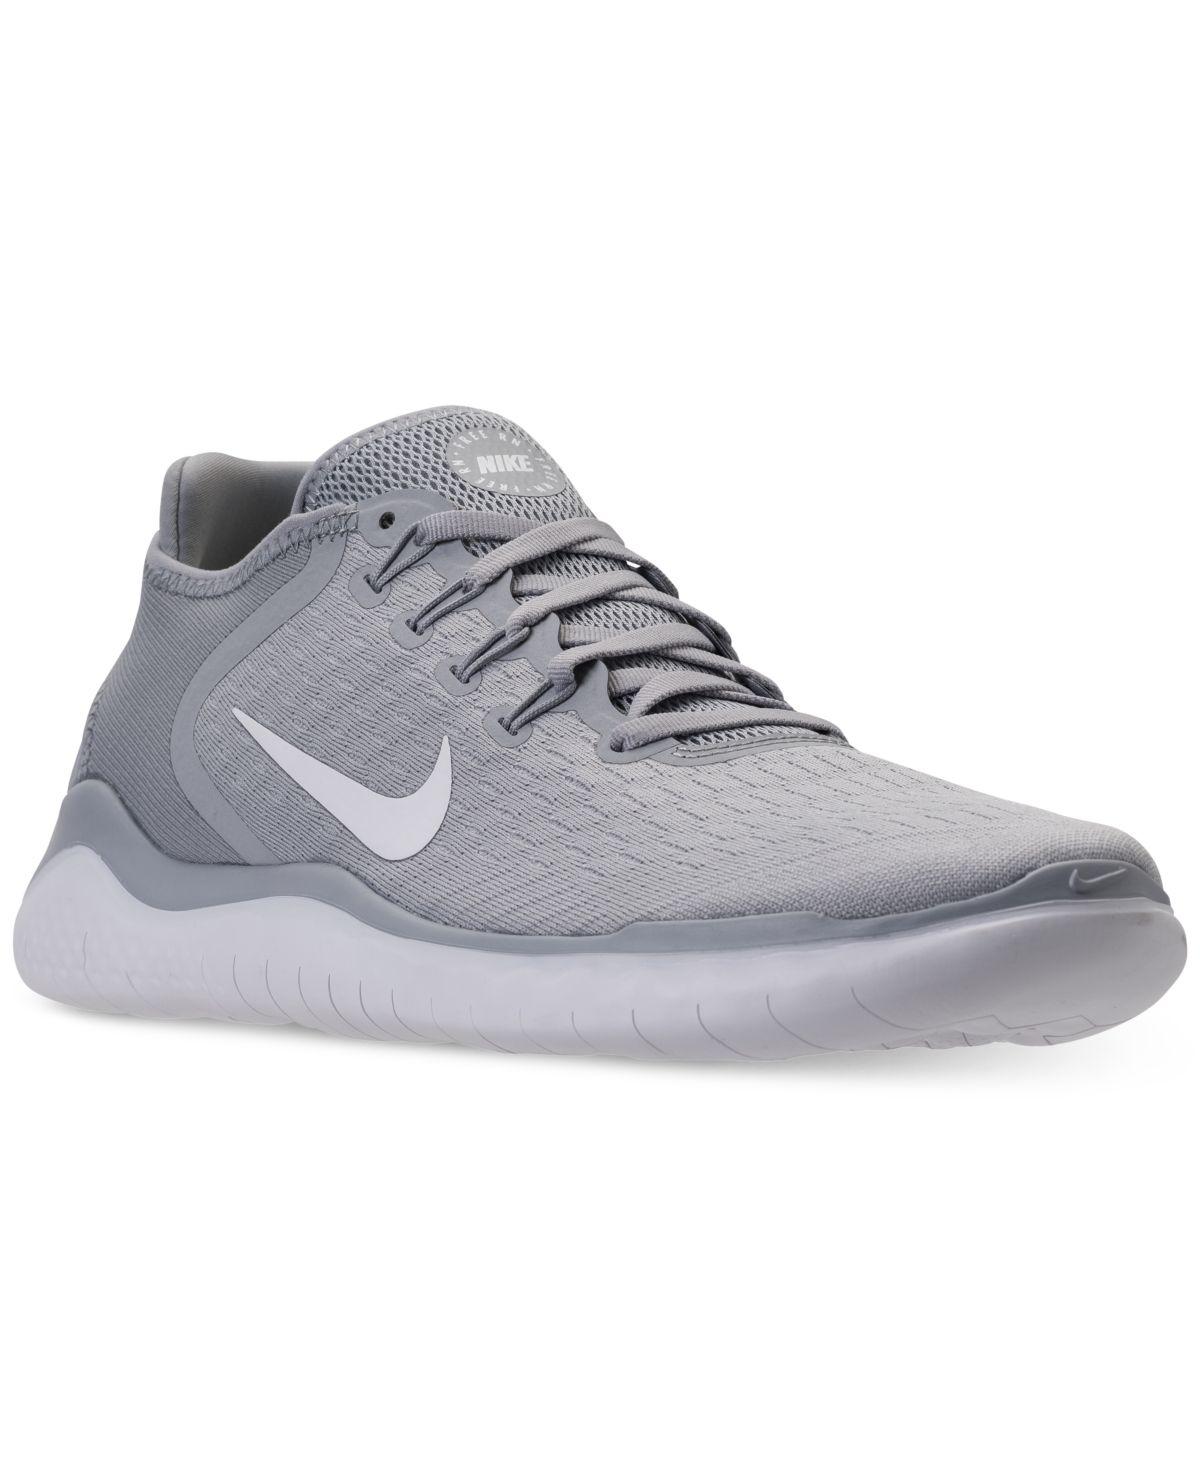 Running sneakers, Nike men